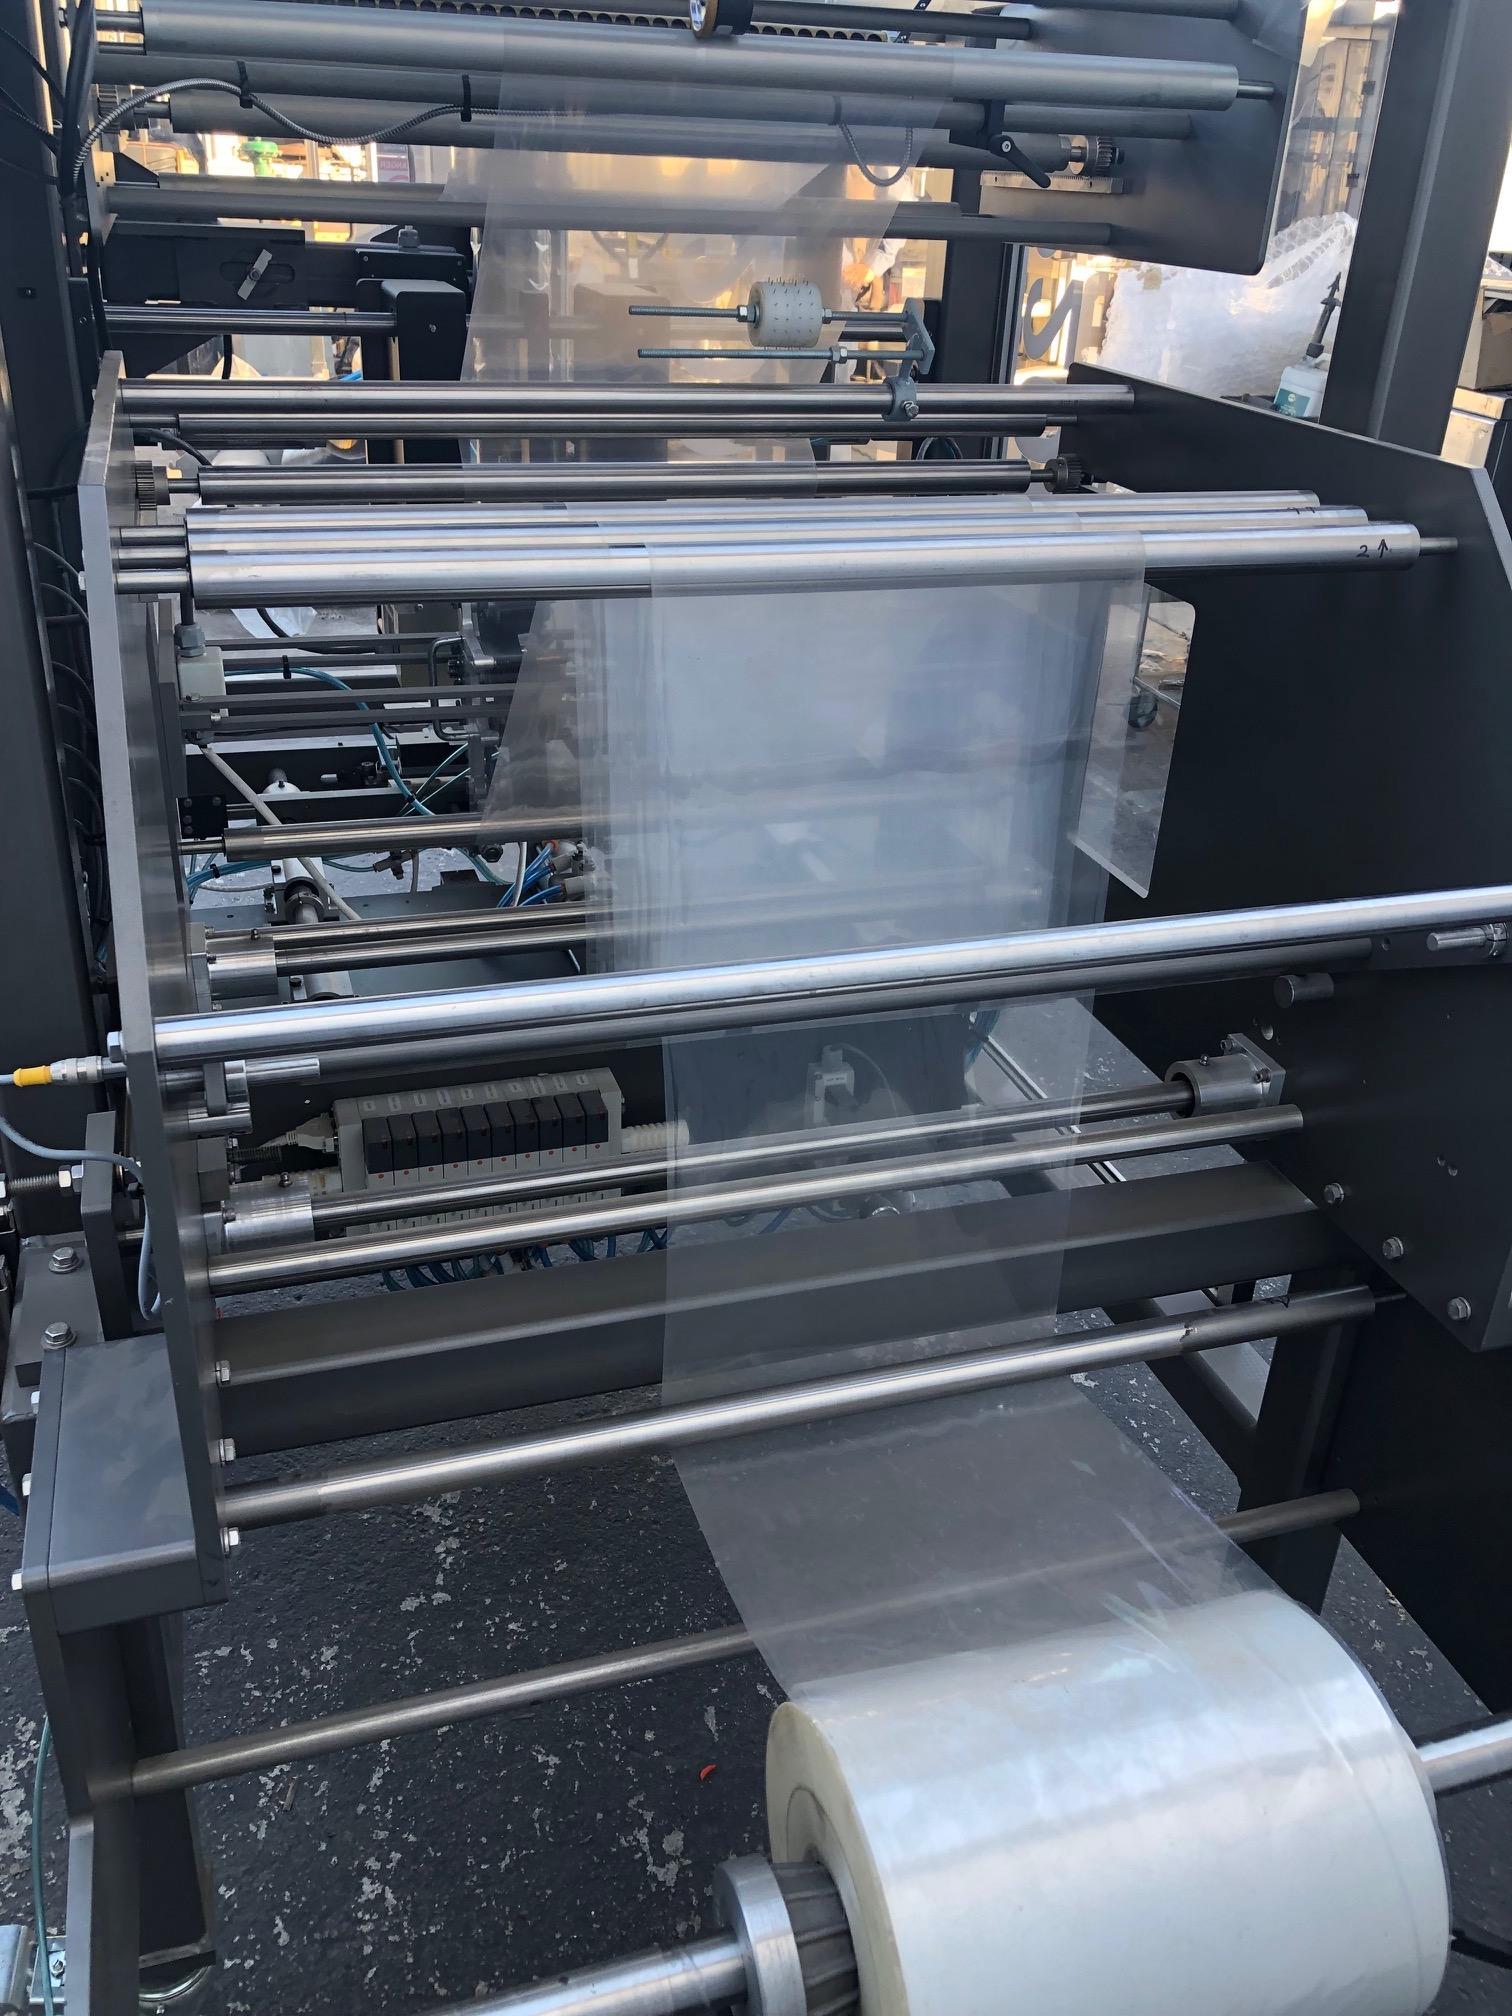 Taylor Products Vertical Form/Fill/Seal Unit, Model V2200P